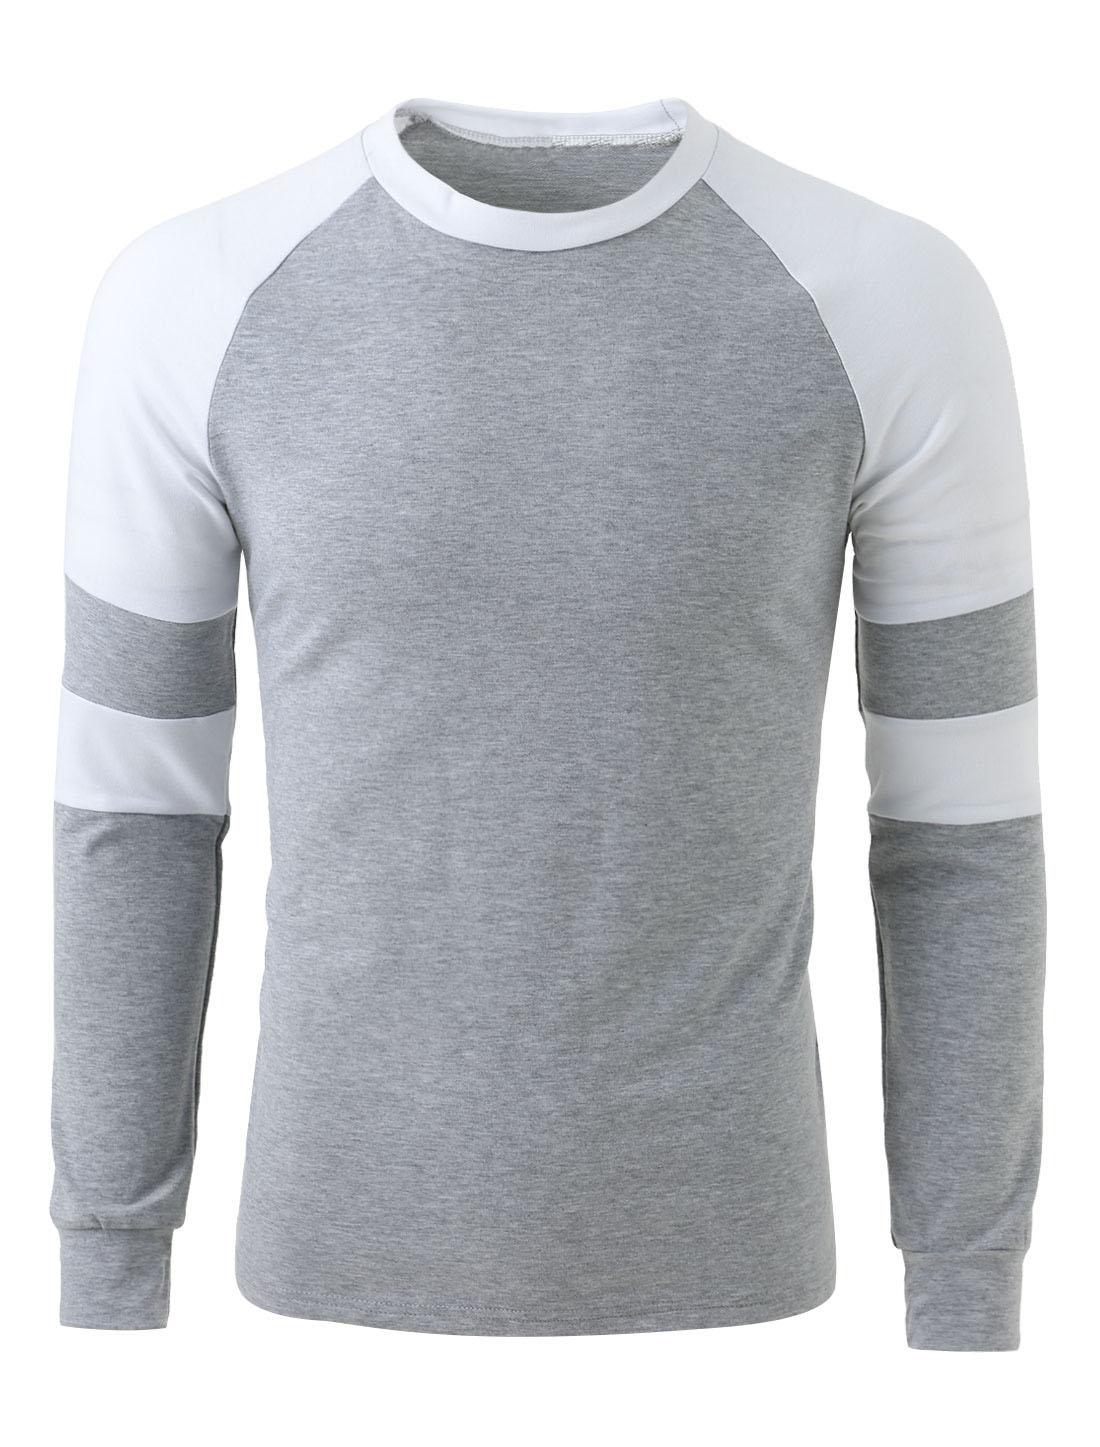 Men Raglan Sleeve Contrast Color Slim Fit T Shirt Light Gray L